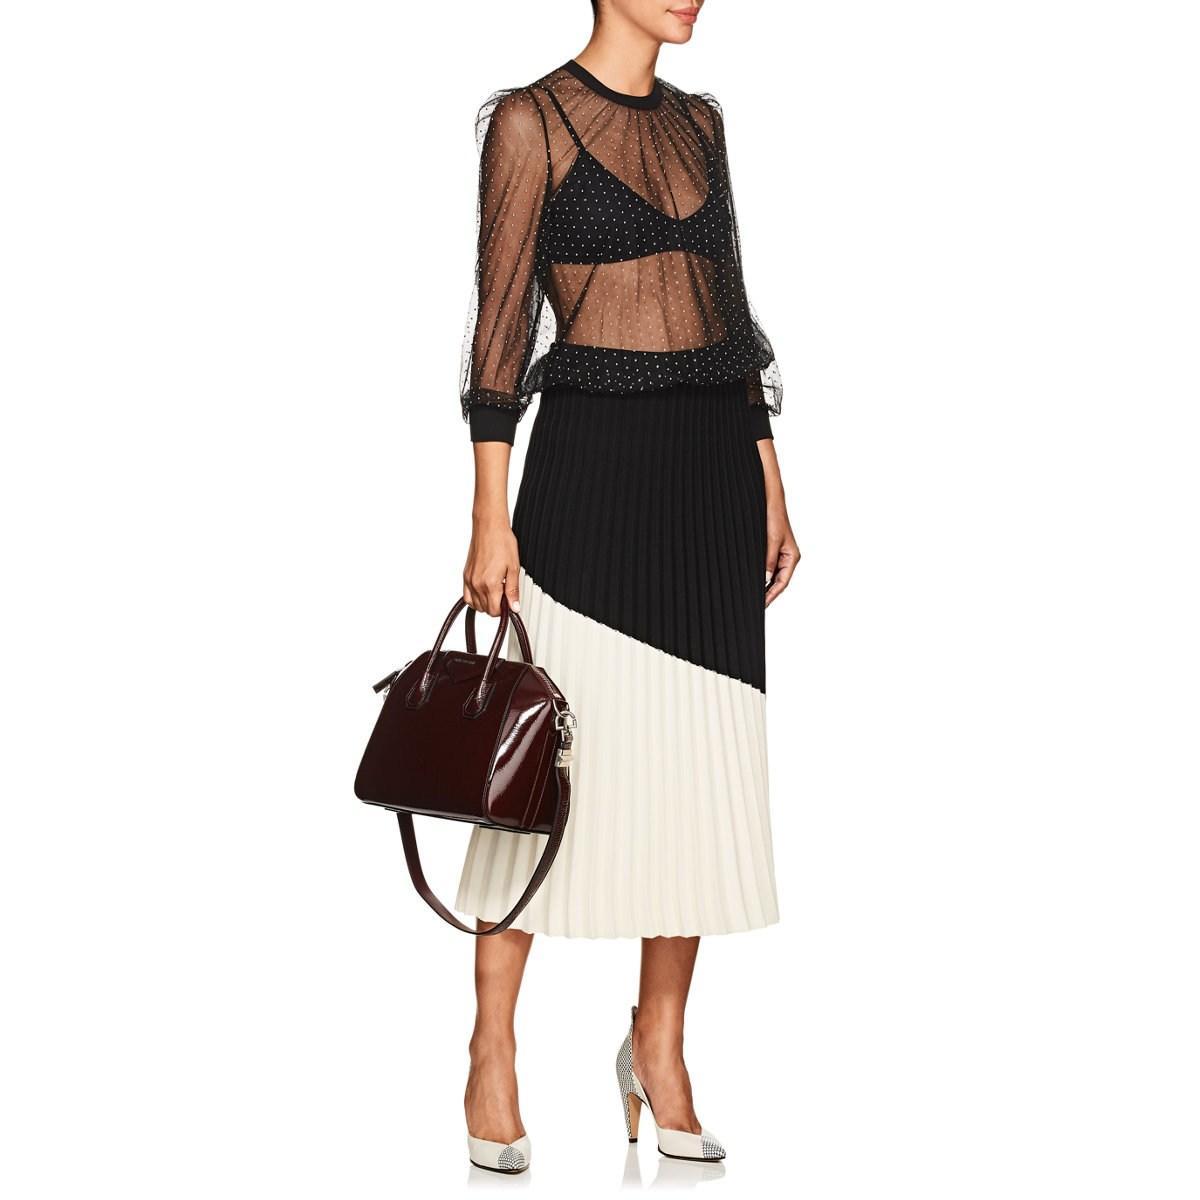 6832f2caf83 Givenchy - Purple Antigona Small Patent Leather Duffel Bag - Lyst. View  fullscreen